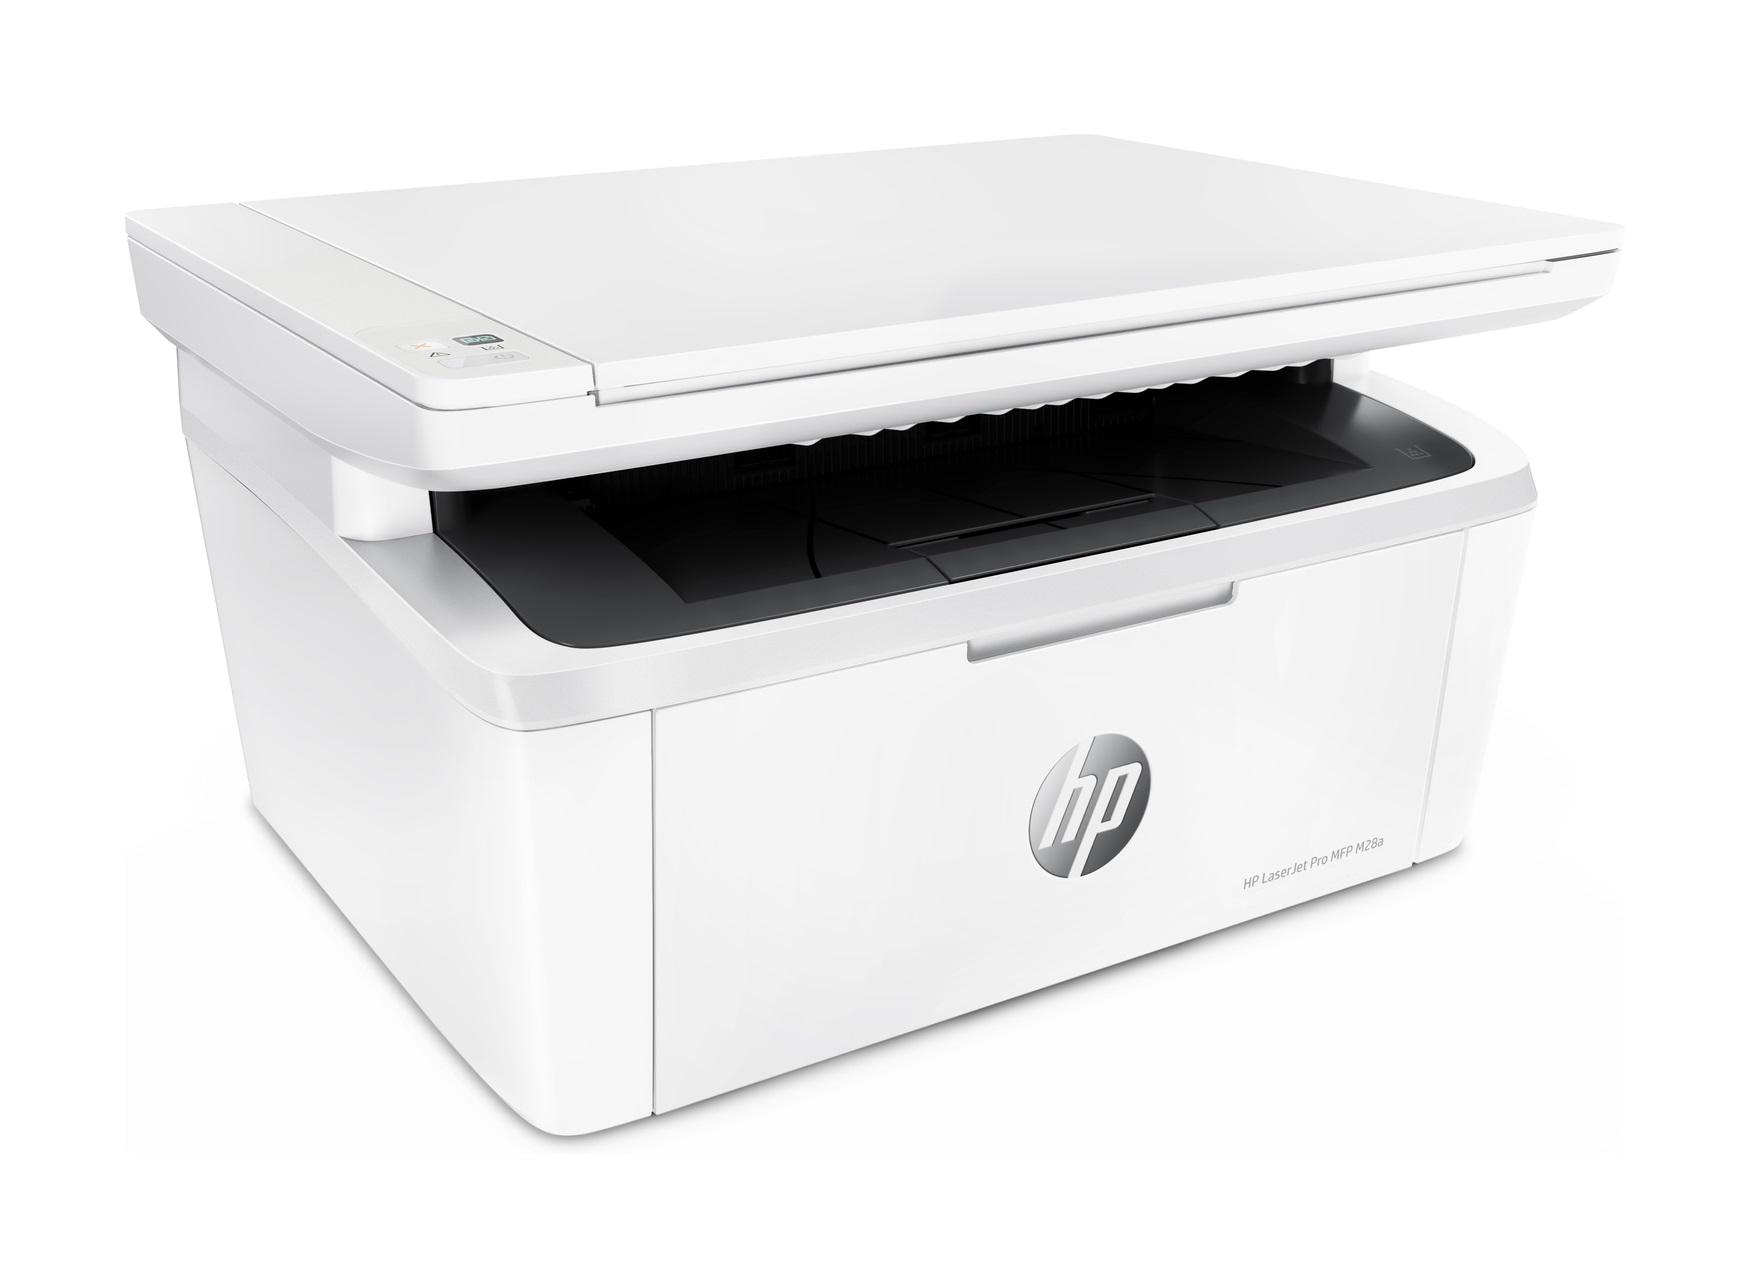 Hp Laserjet Pro Mfp M28a Scheda Tecnica Stampanti Hp